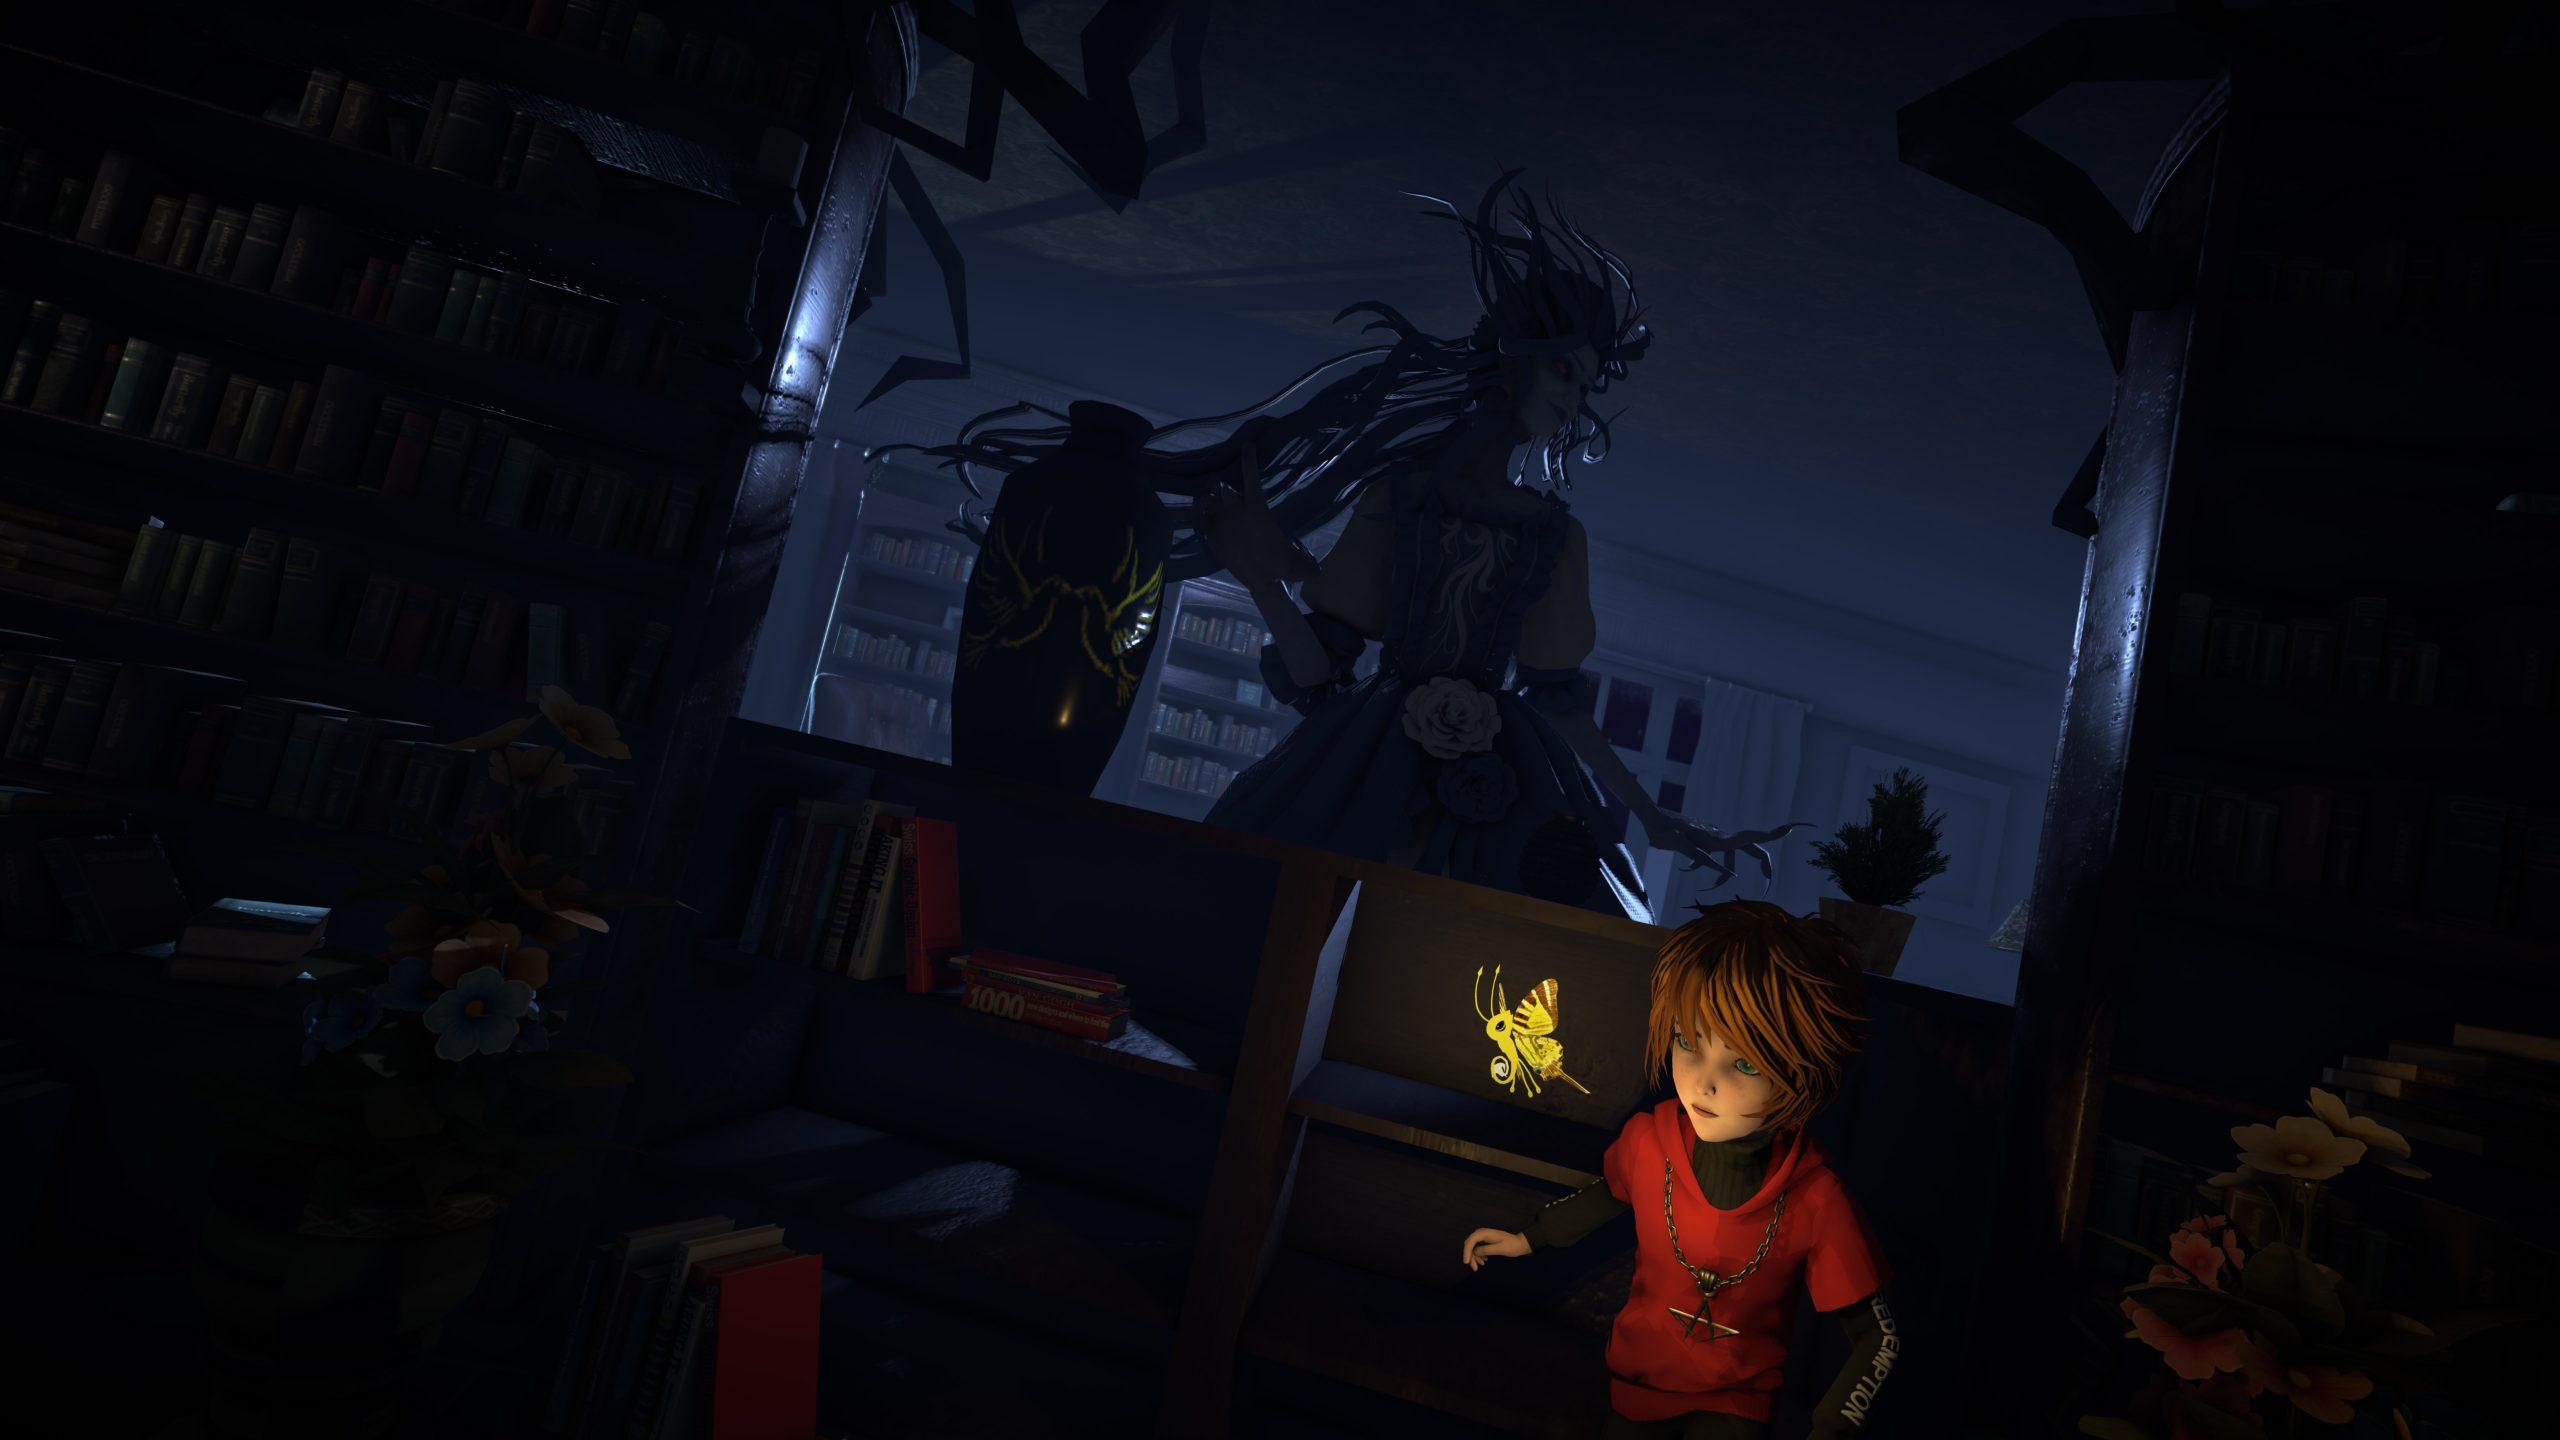 Nightmare_01-1-scaled